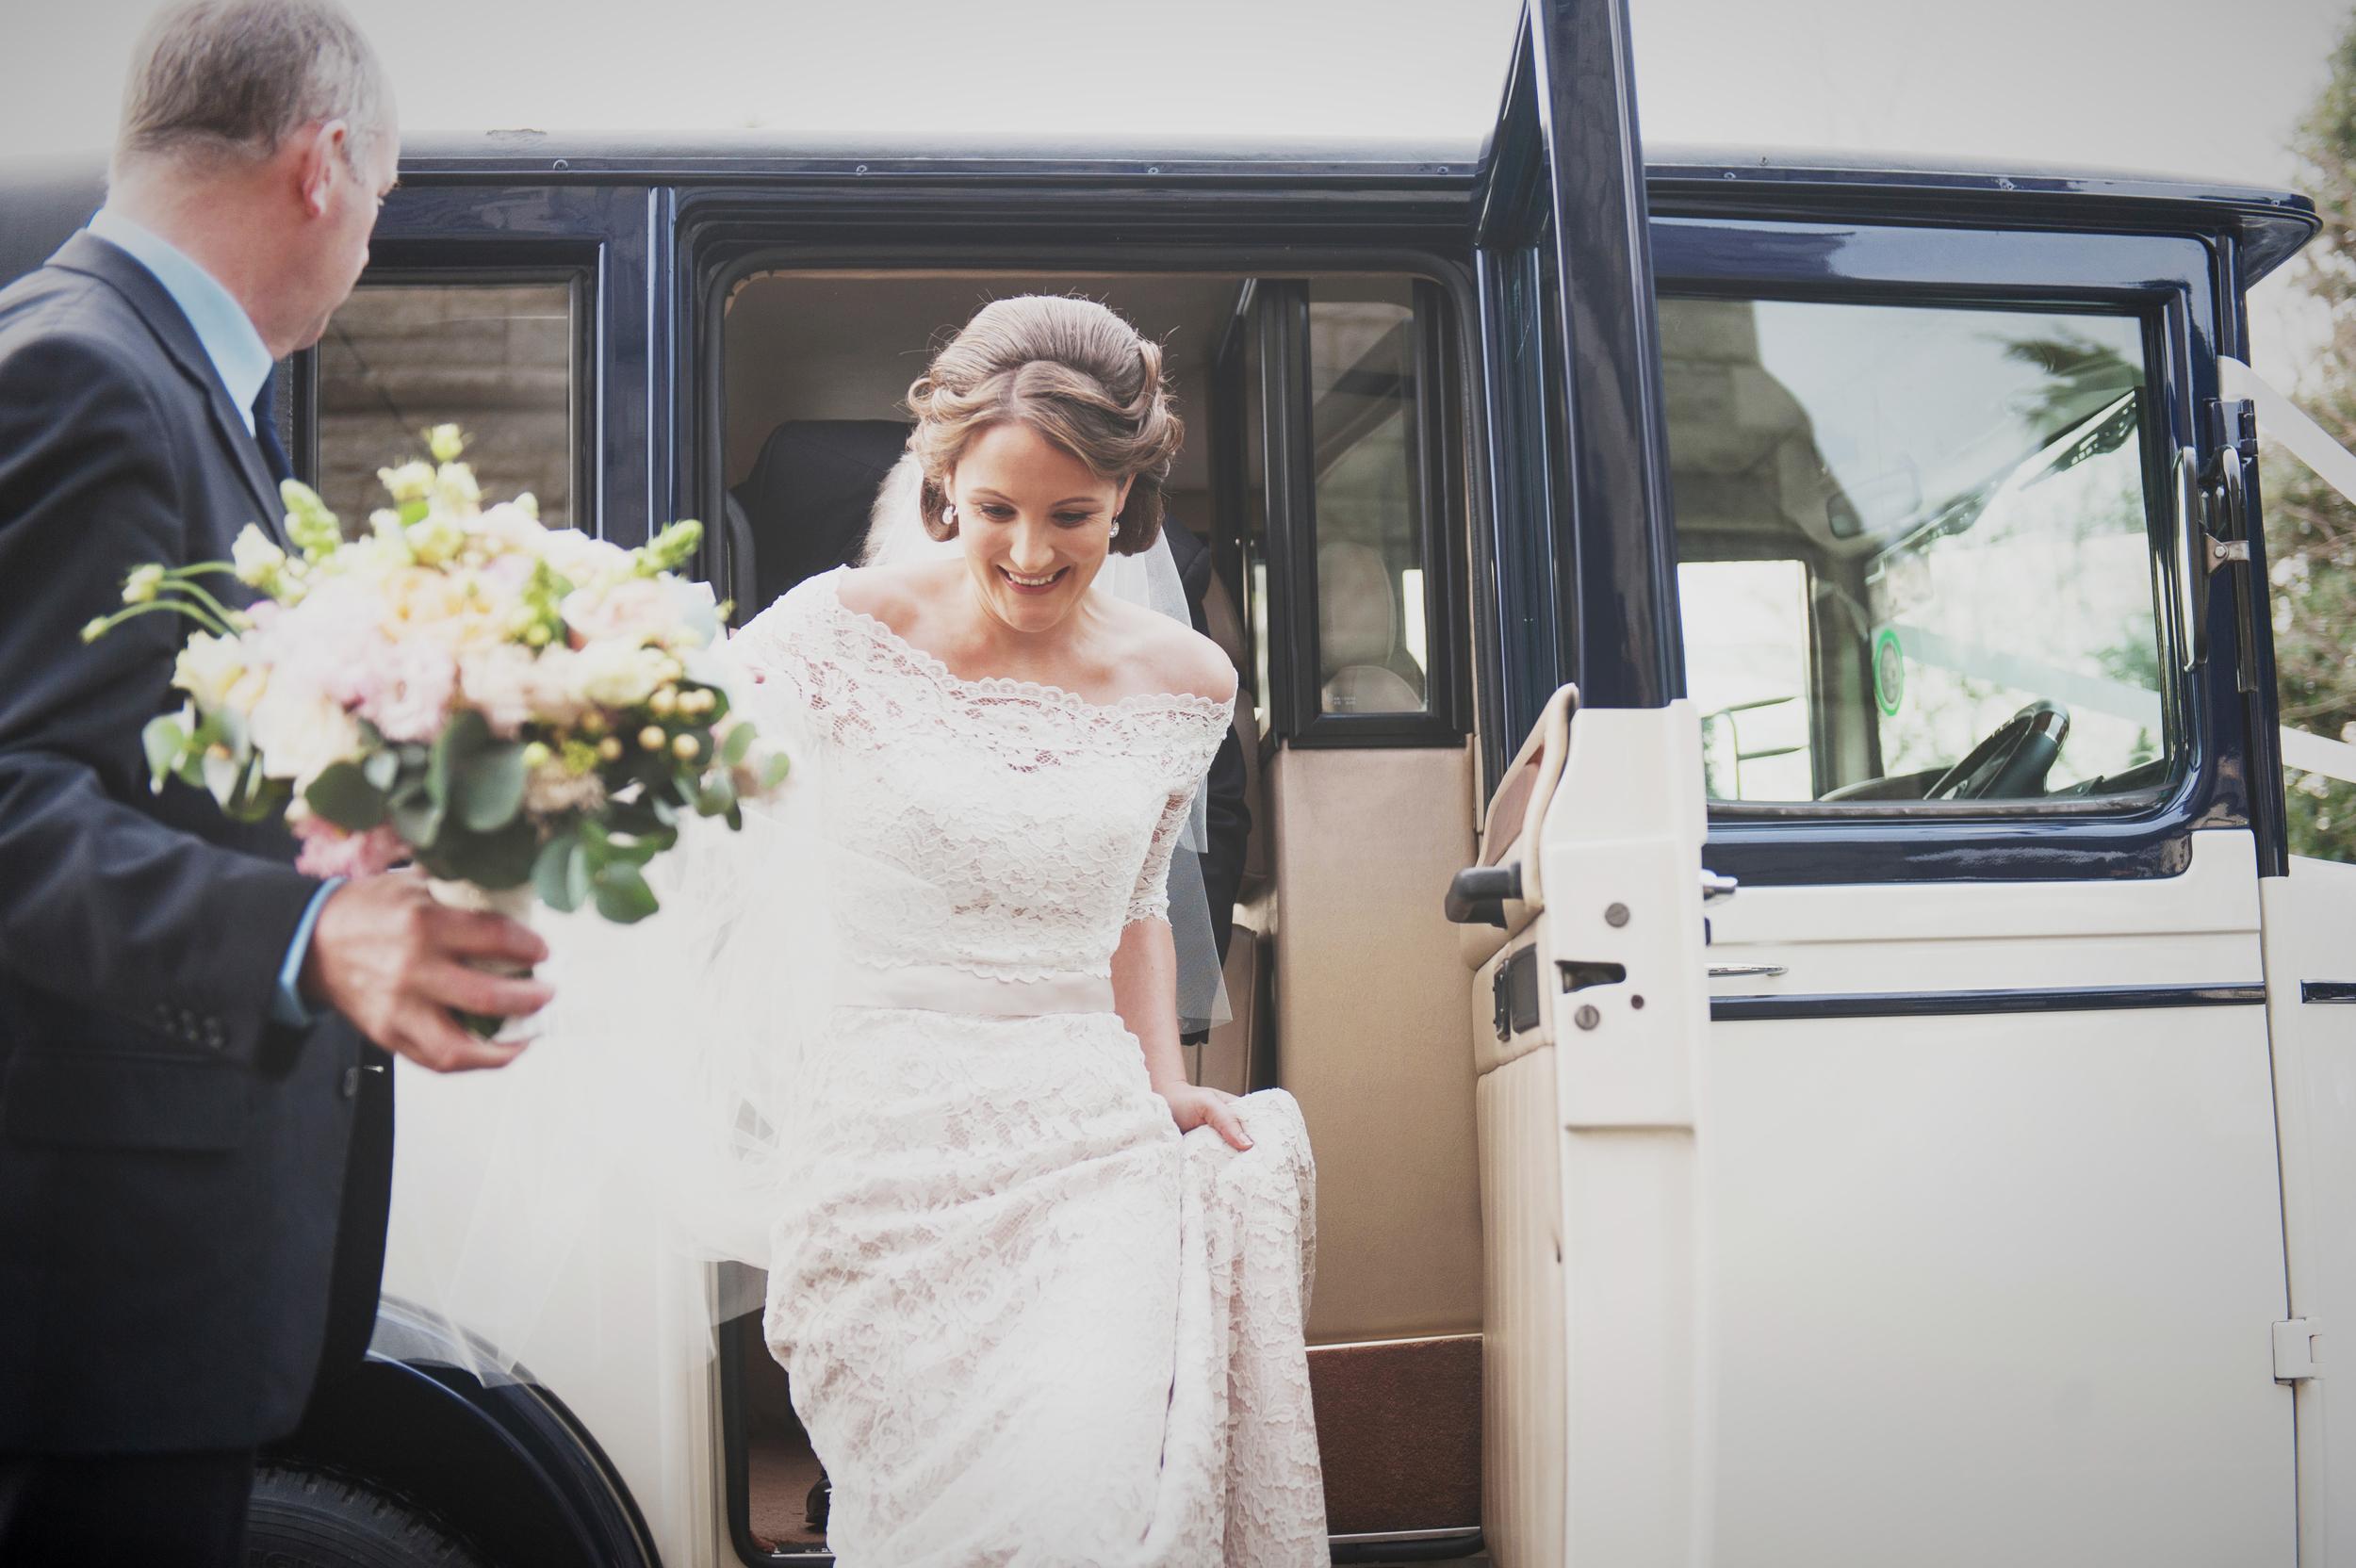 Carton_House_Wedding_Photography_Maynooth_Ireland_037.jpg